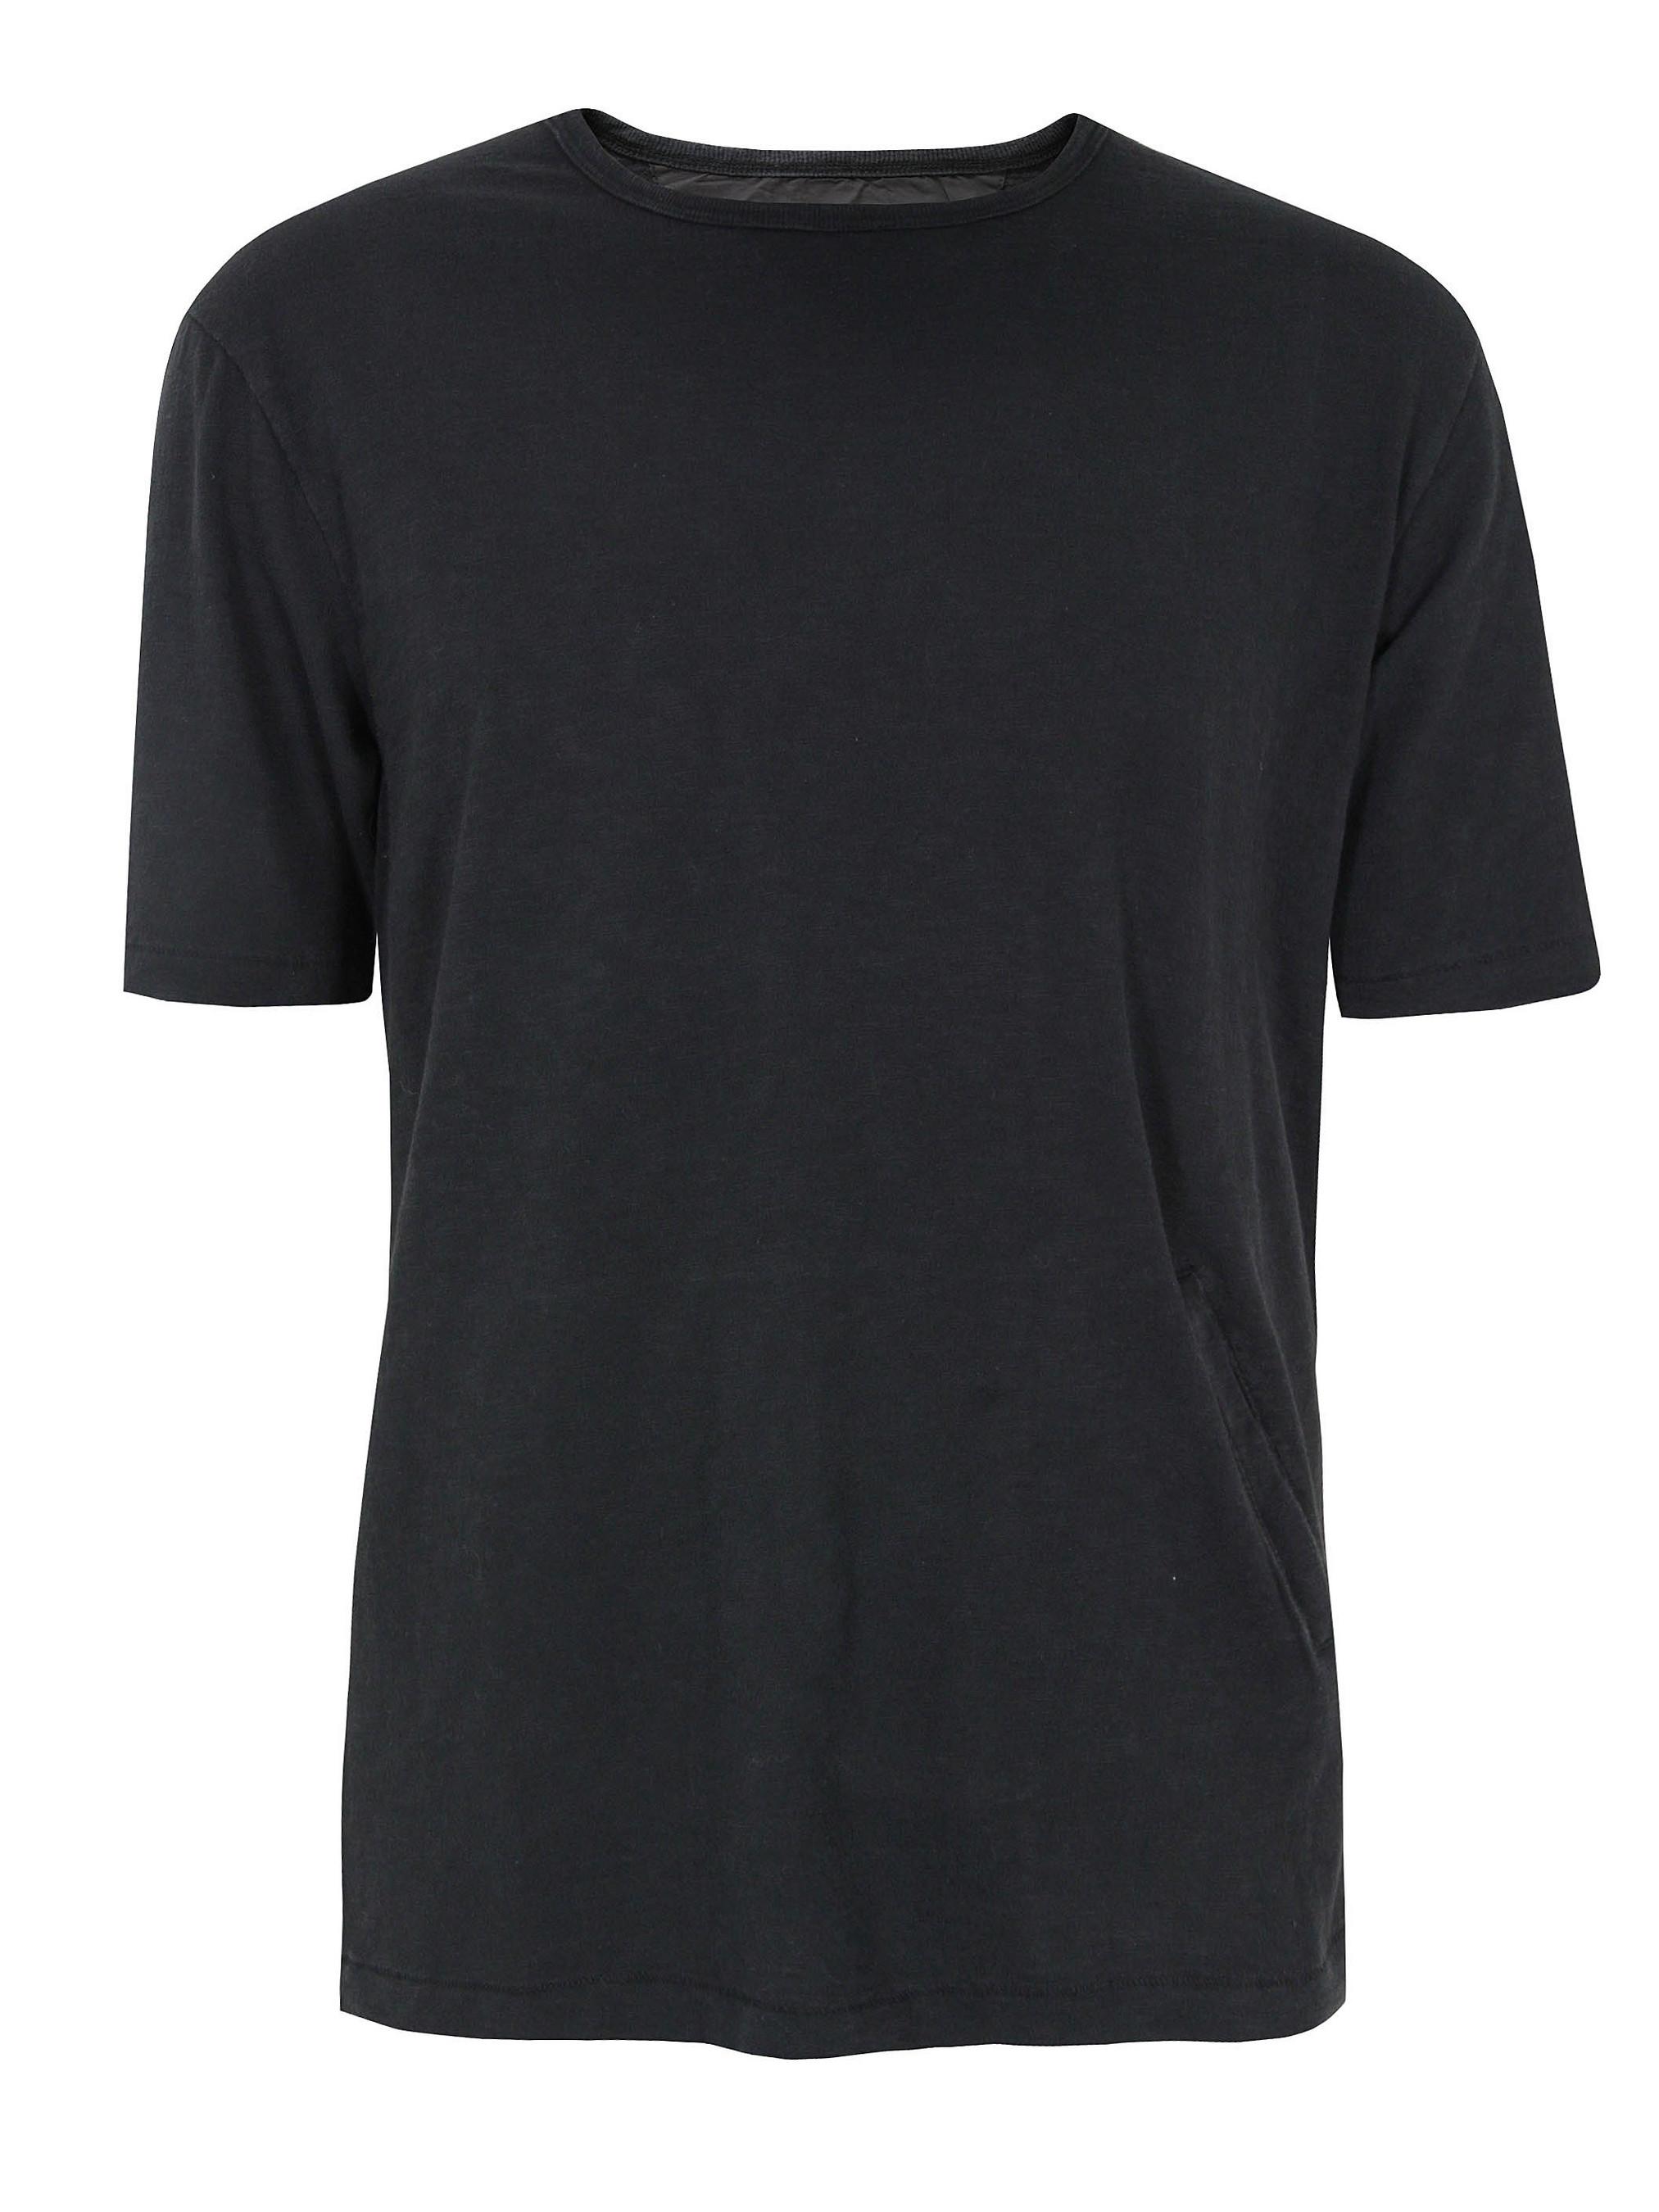 T Shirt Black Clipart Best